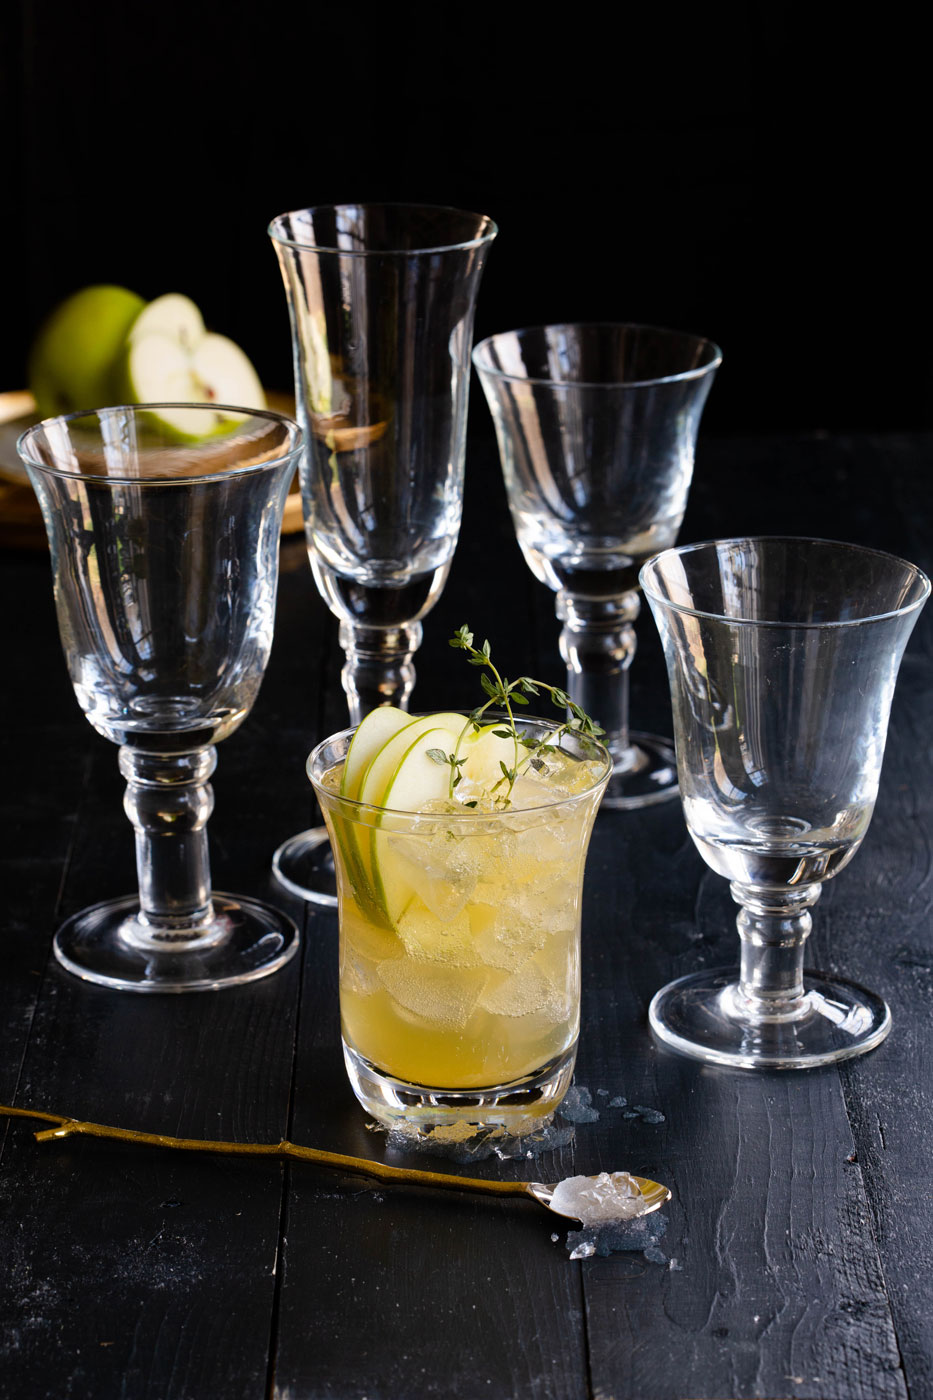 vietri-classic-glass1.jpg